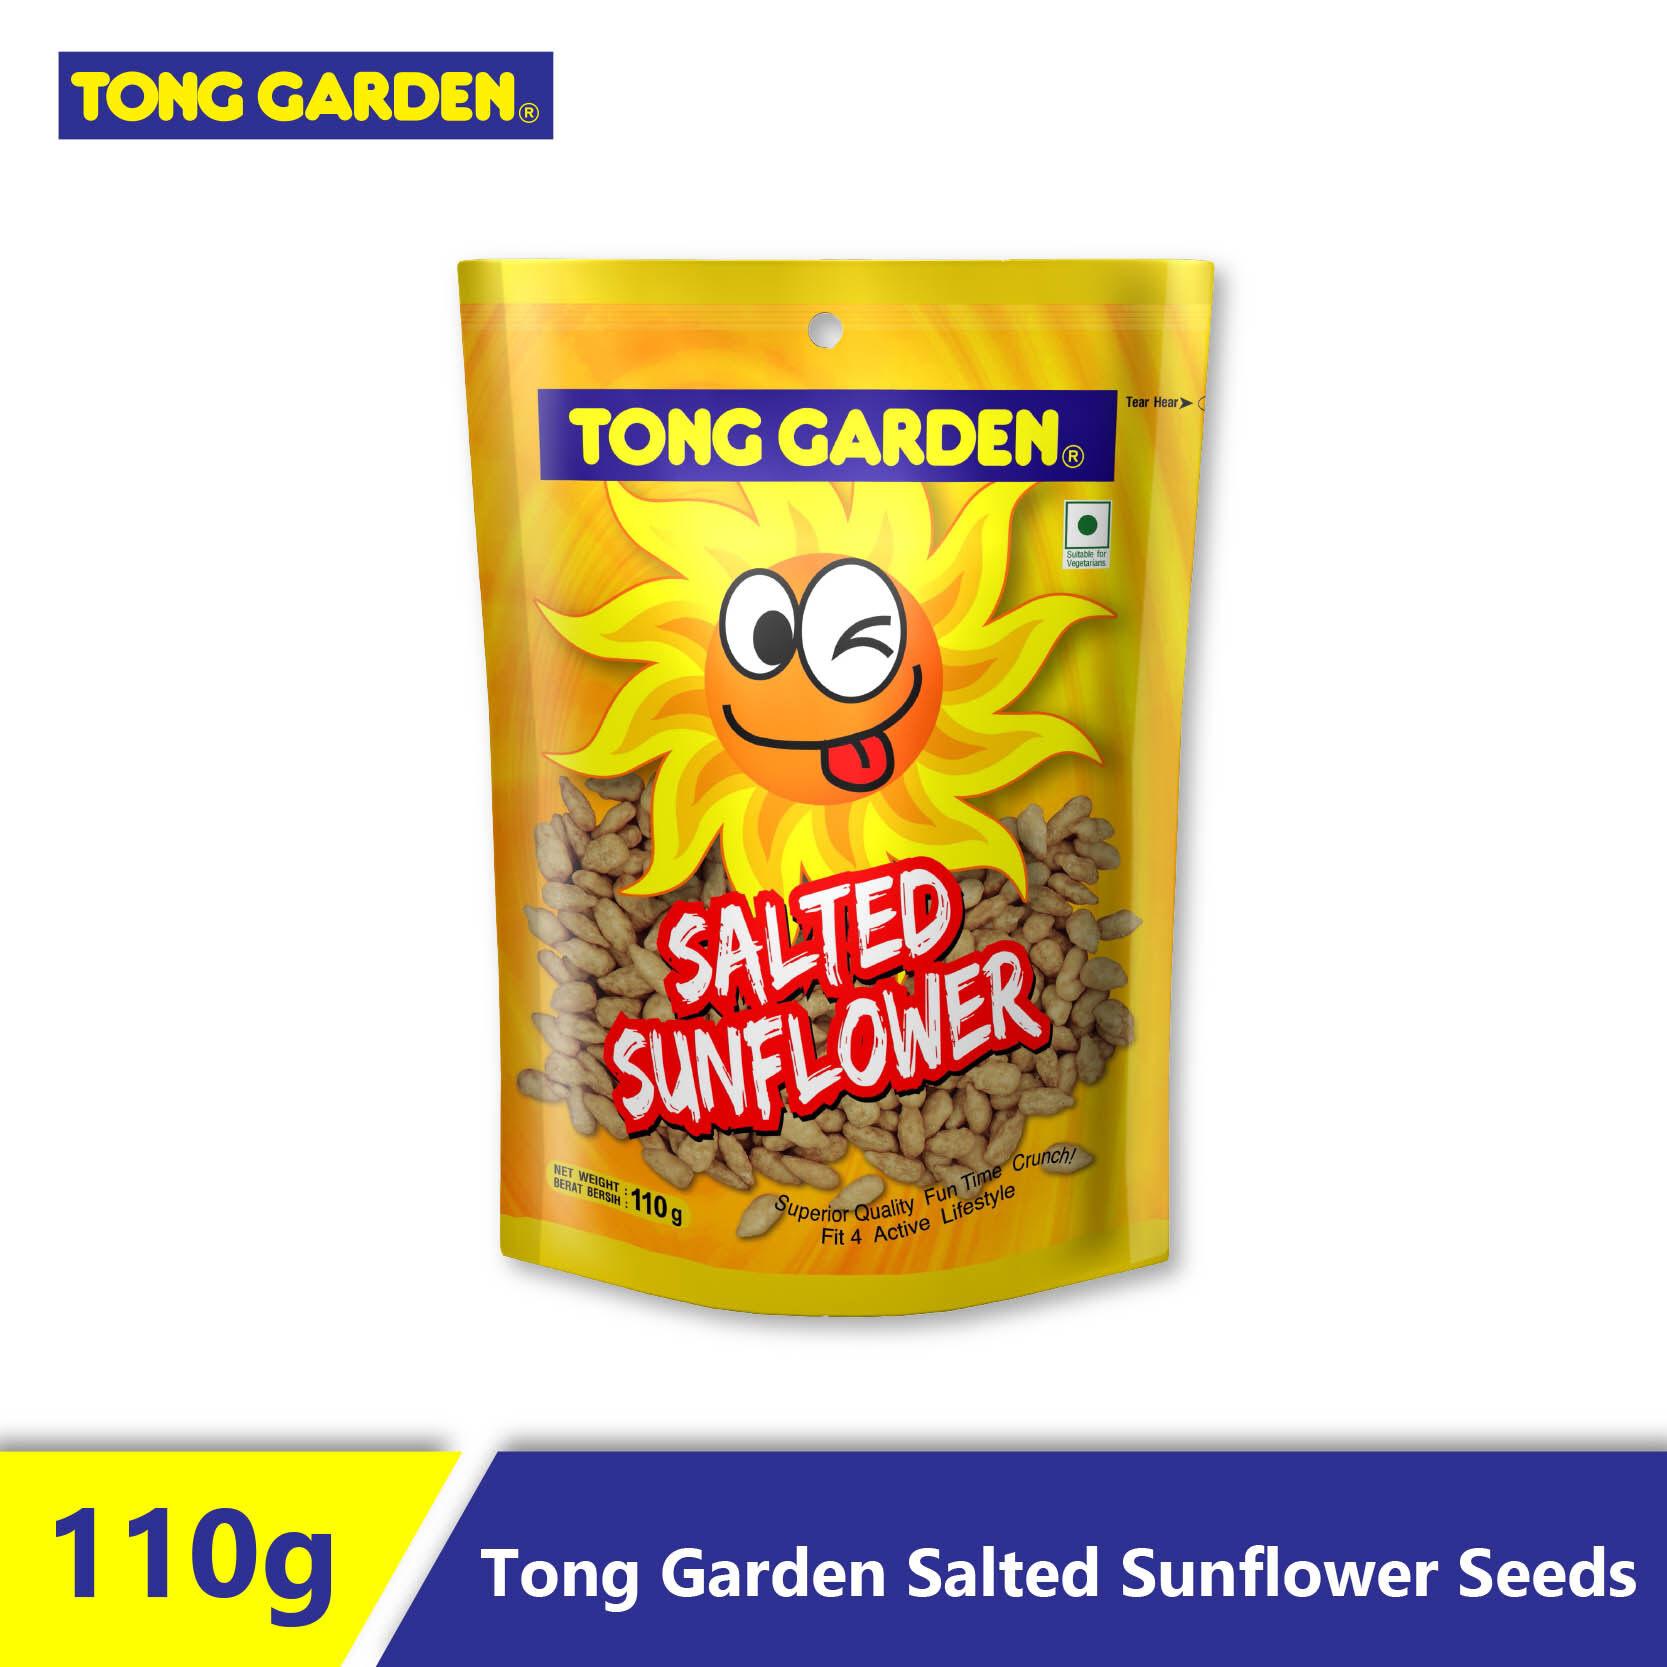 Tong Garden Salted Sunflower Seeds (10 in 1)